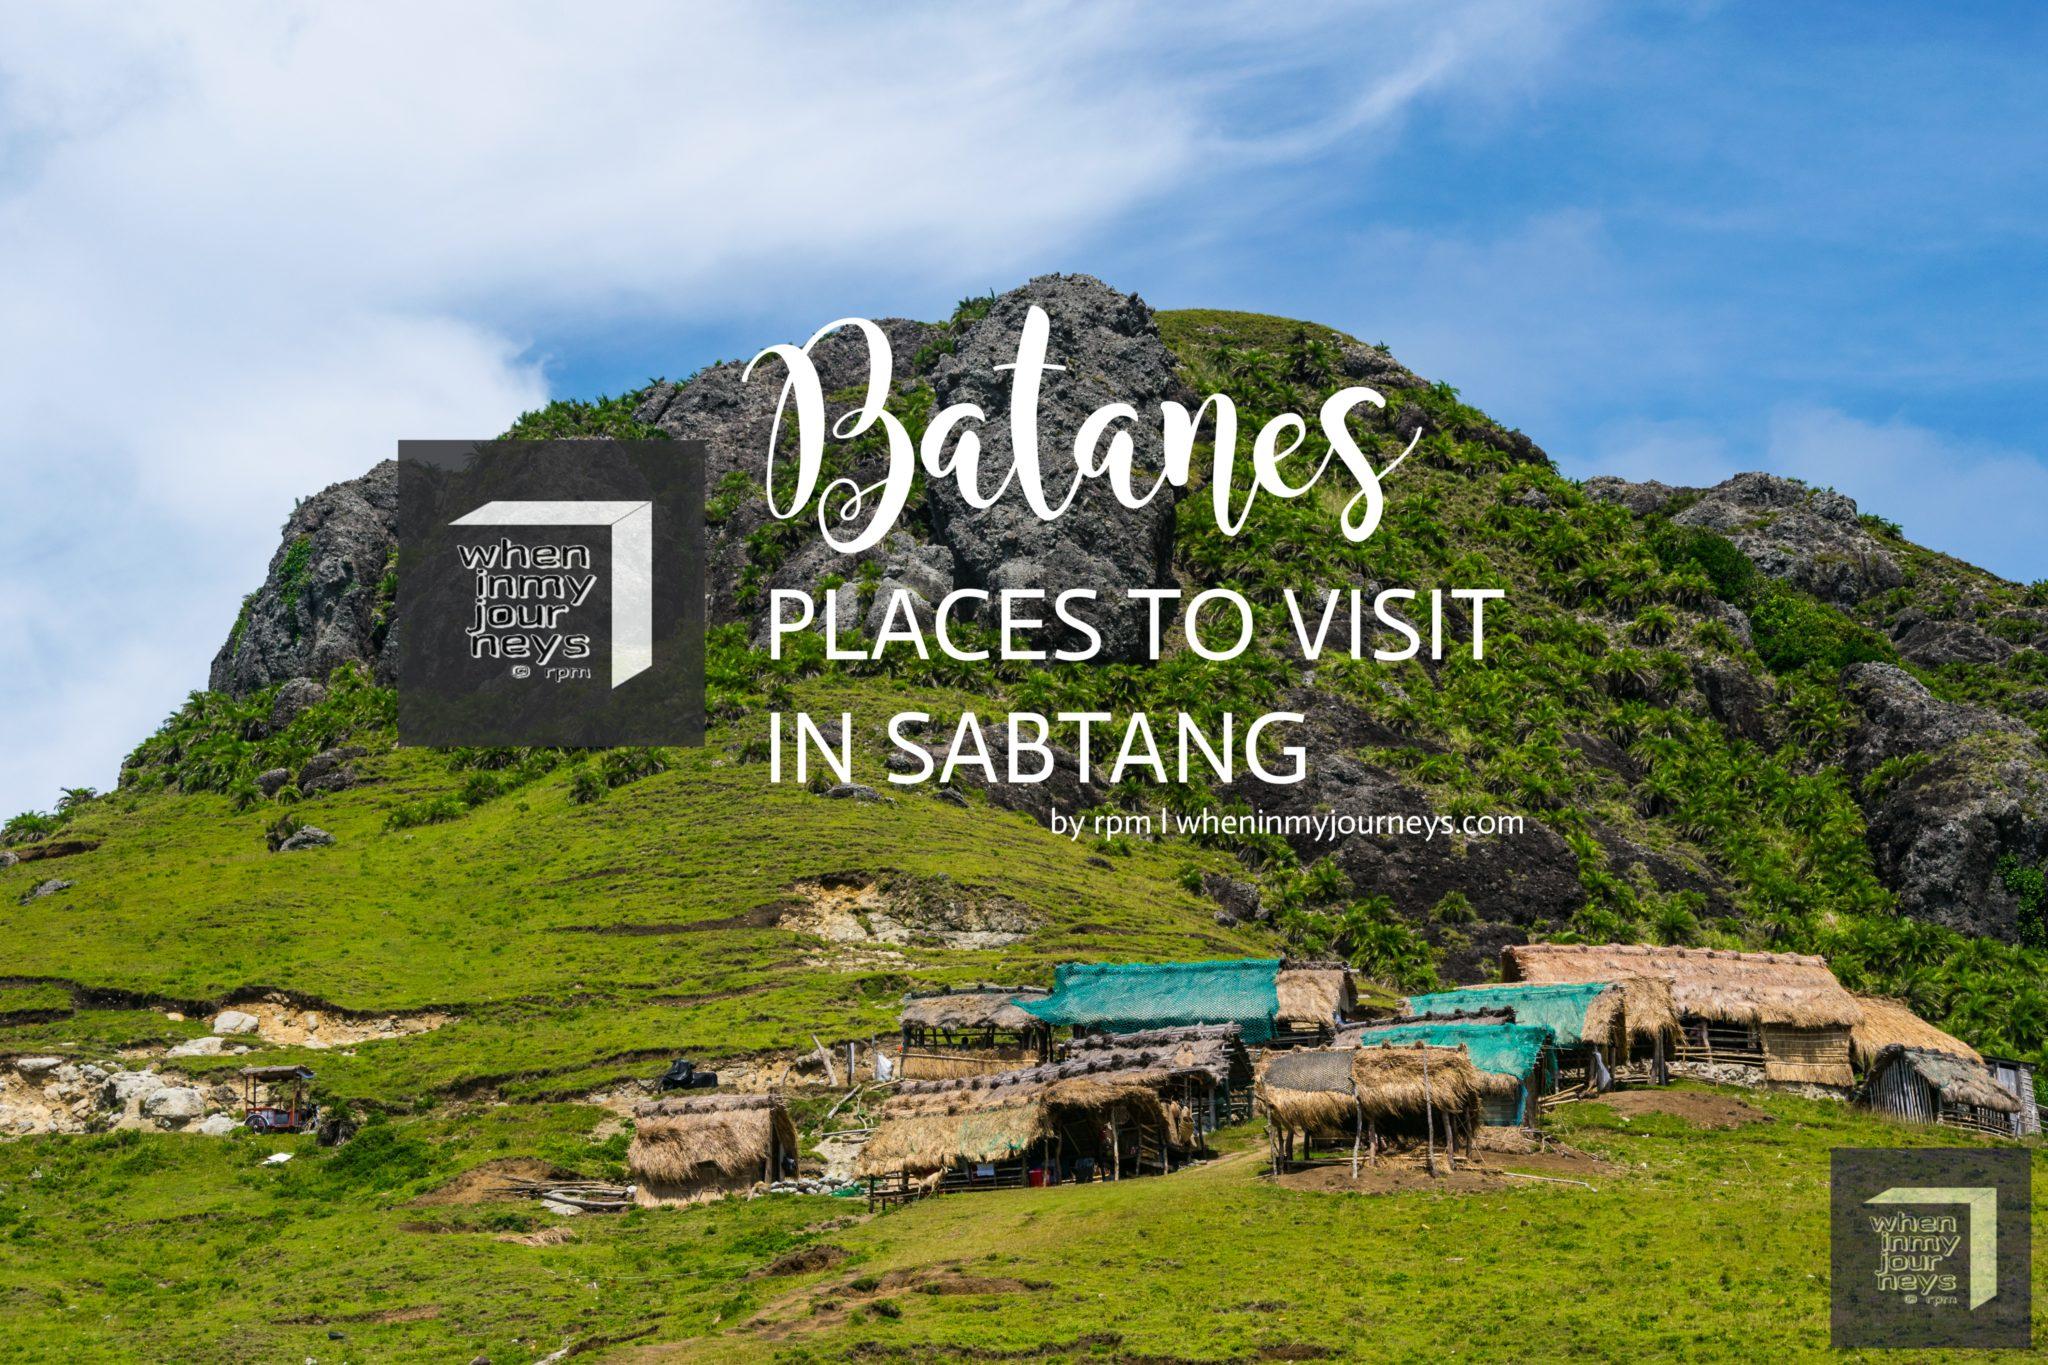 Batanes Places to Visit in Sabtang